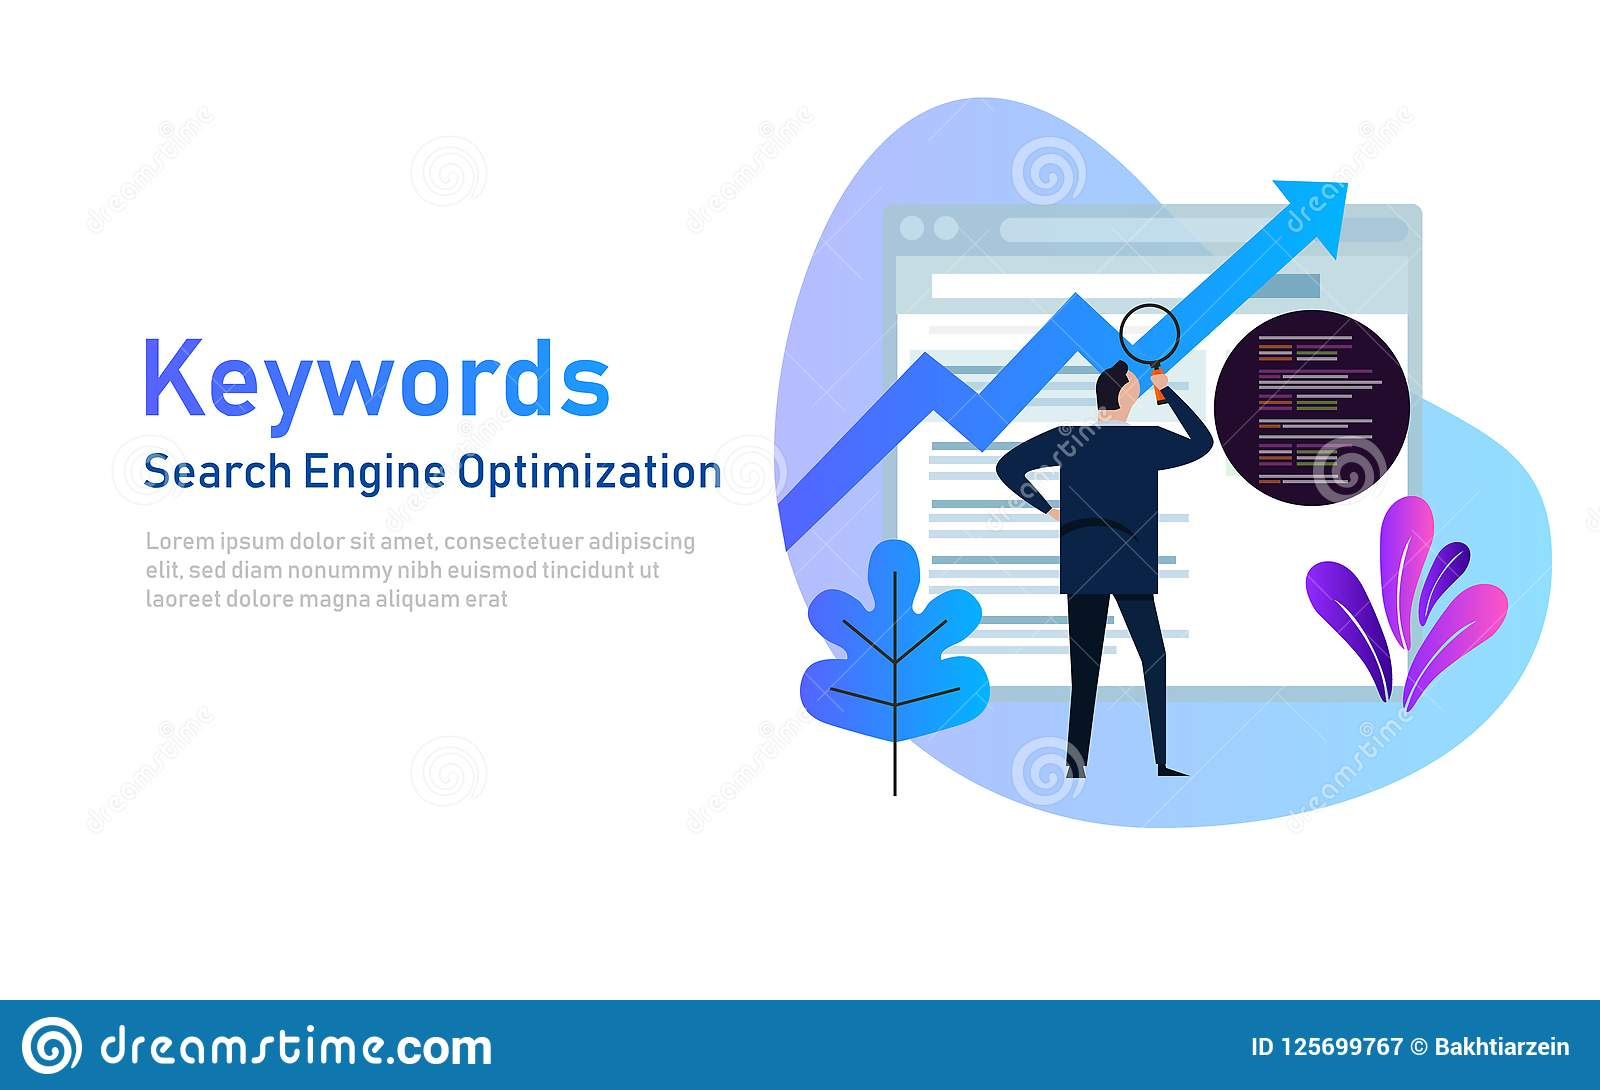 Keywording, έρευνα λέξης κλειδιού SEO, λέξεις κλειδιά που ταξινομεί τη βελτιστοποίηση στη μηχανή αναζήτησης Διανυσματική απεικόνι